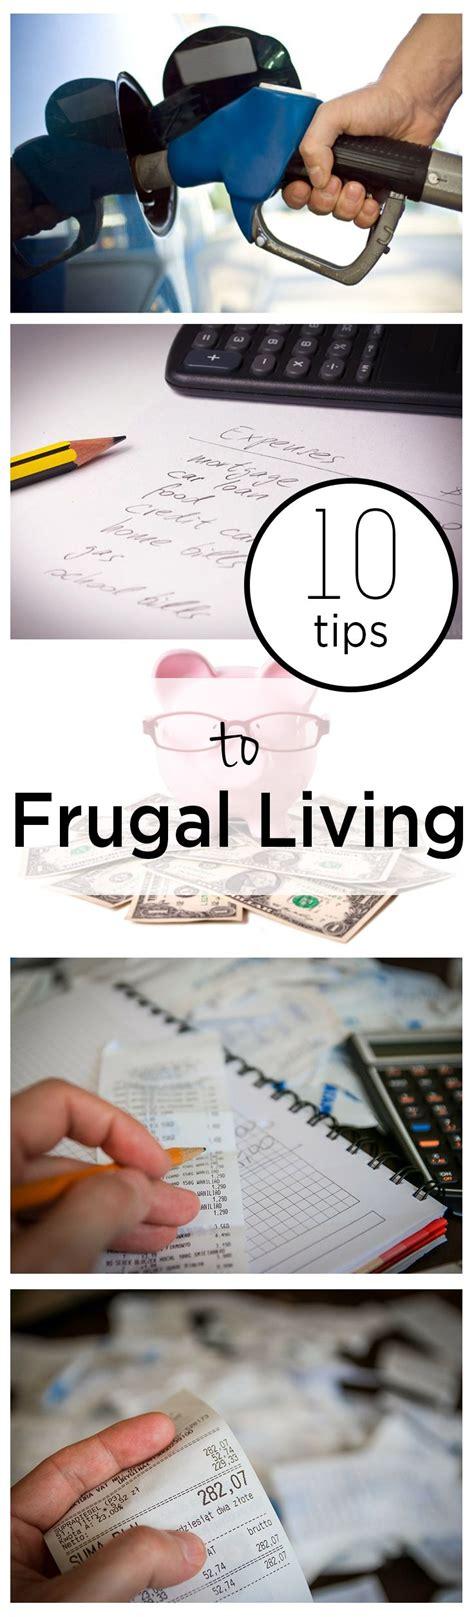 images  frugal living ideas  pinterest